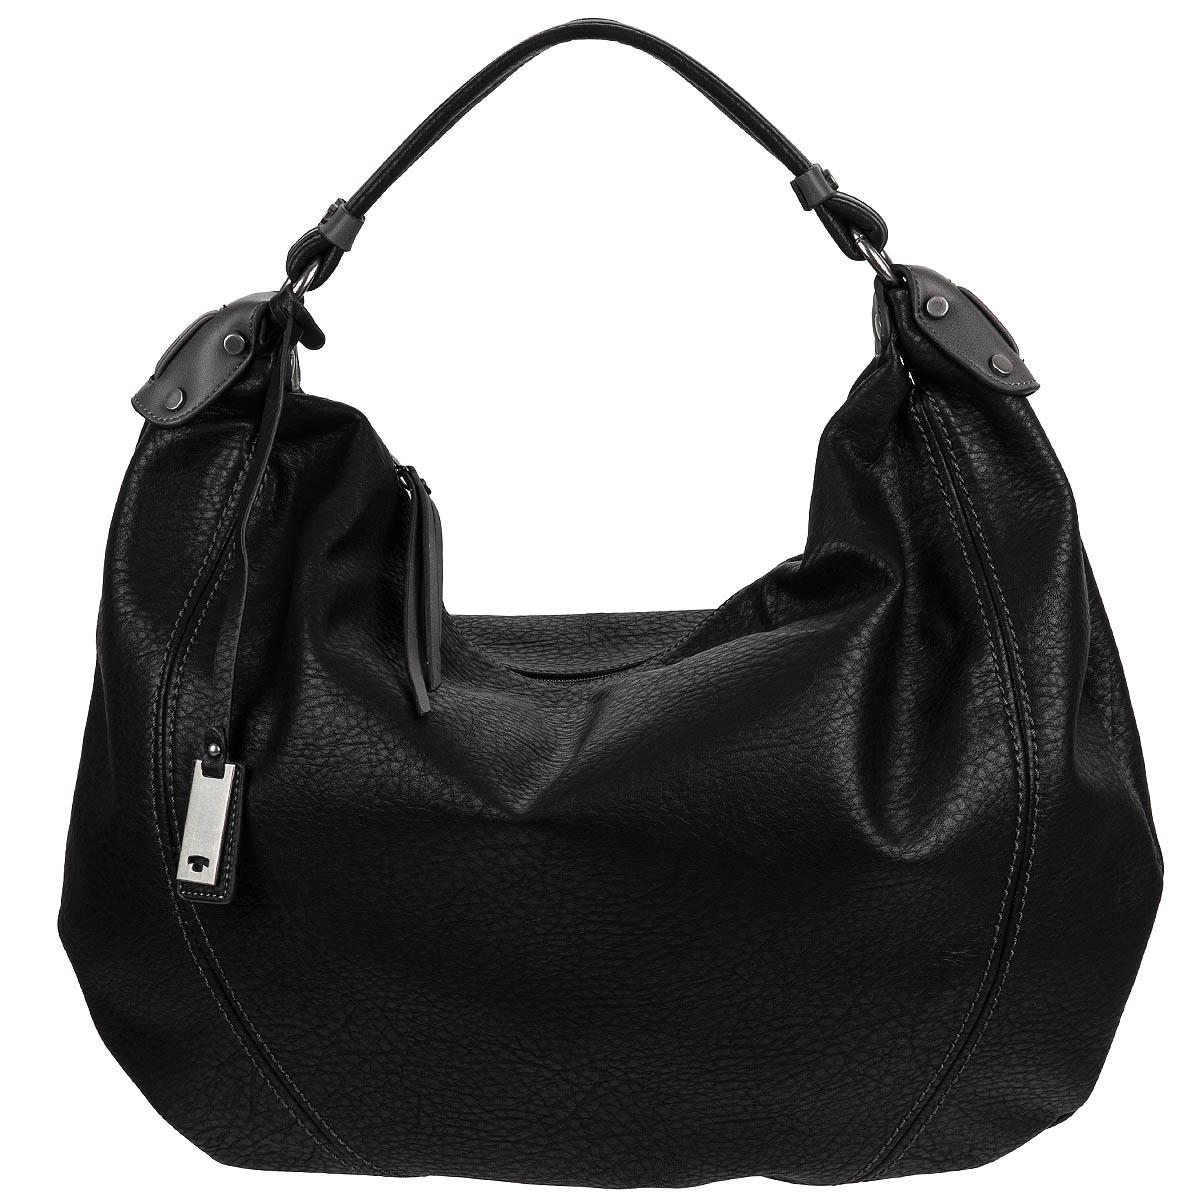 tom tailor joni beuteltasche handtasche tasche. Black Bedroom Furniture Sets. Home Design Ideas